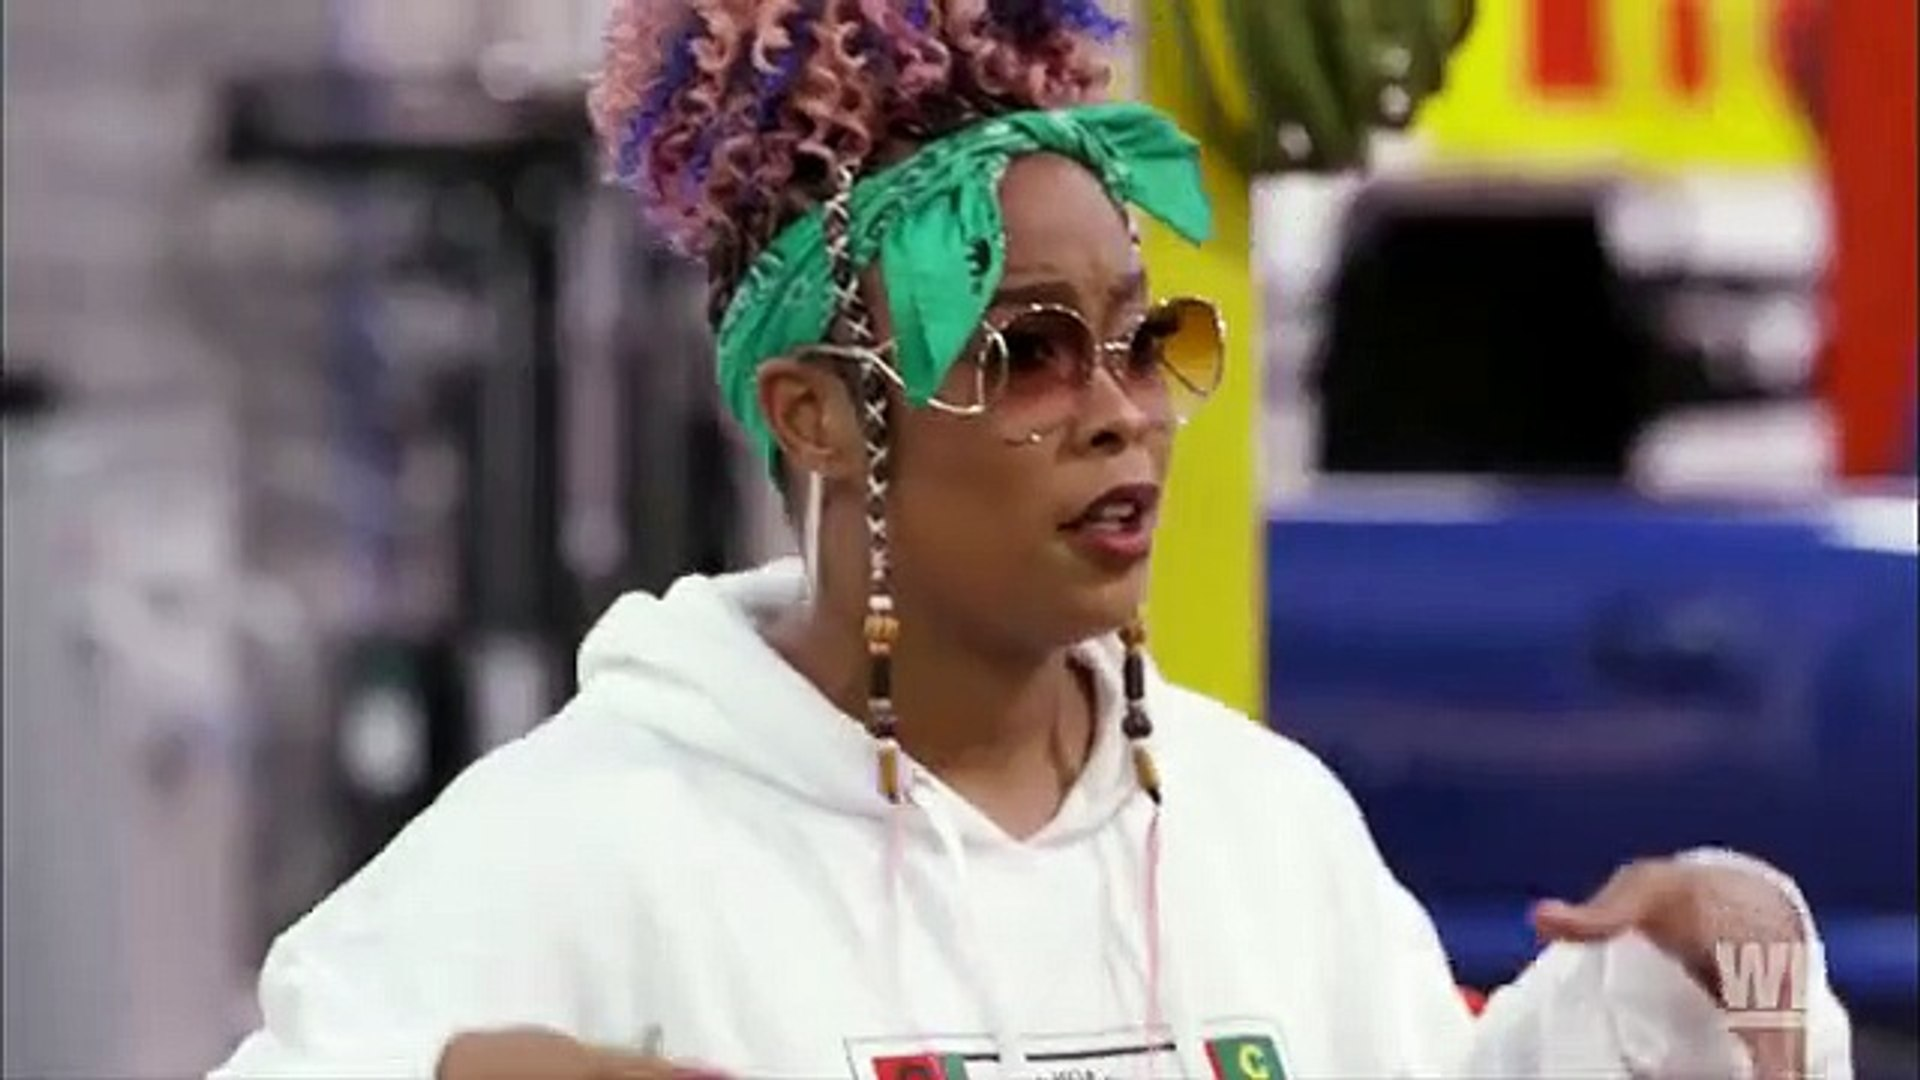 Growing Up Hip Hop: Atlanta - S02E18 - Relationship Goals - December 06, 2018 || Growing Up Hip Hop: